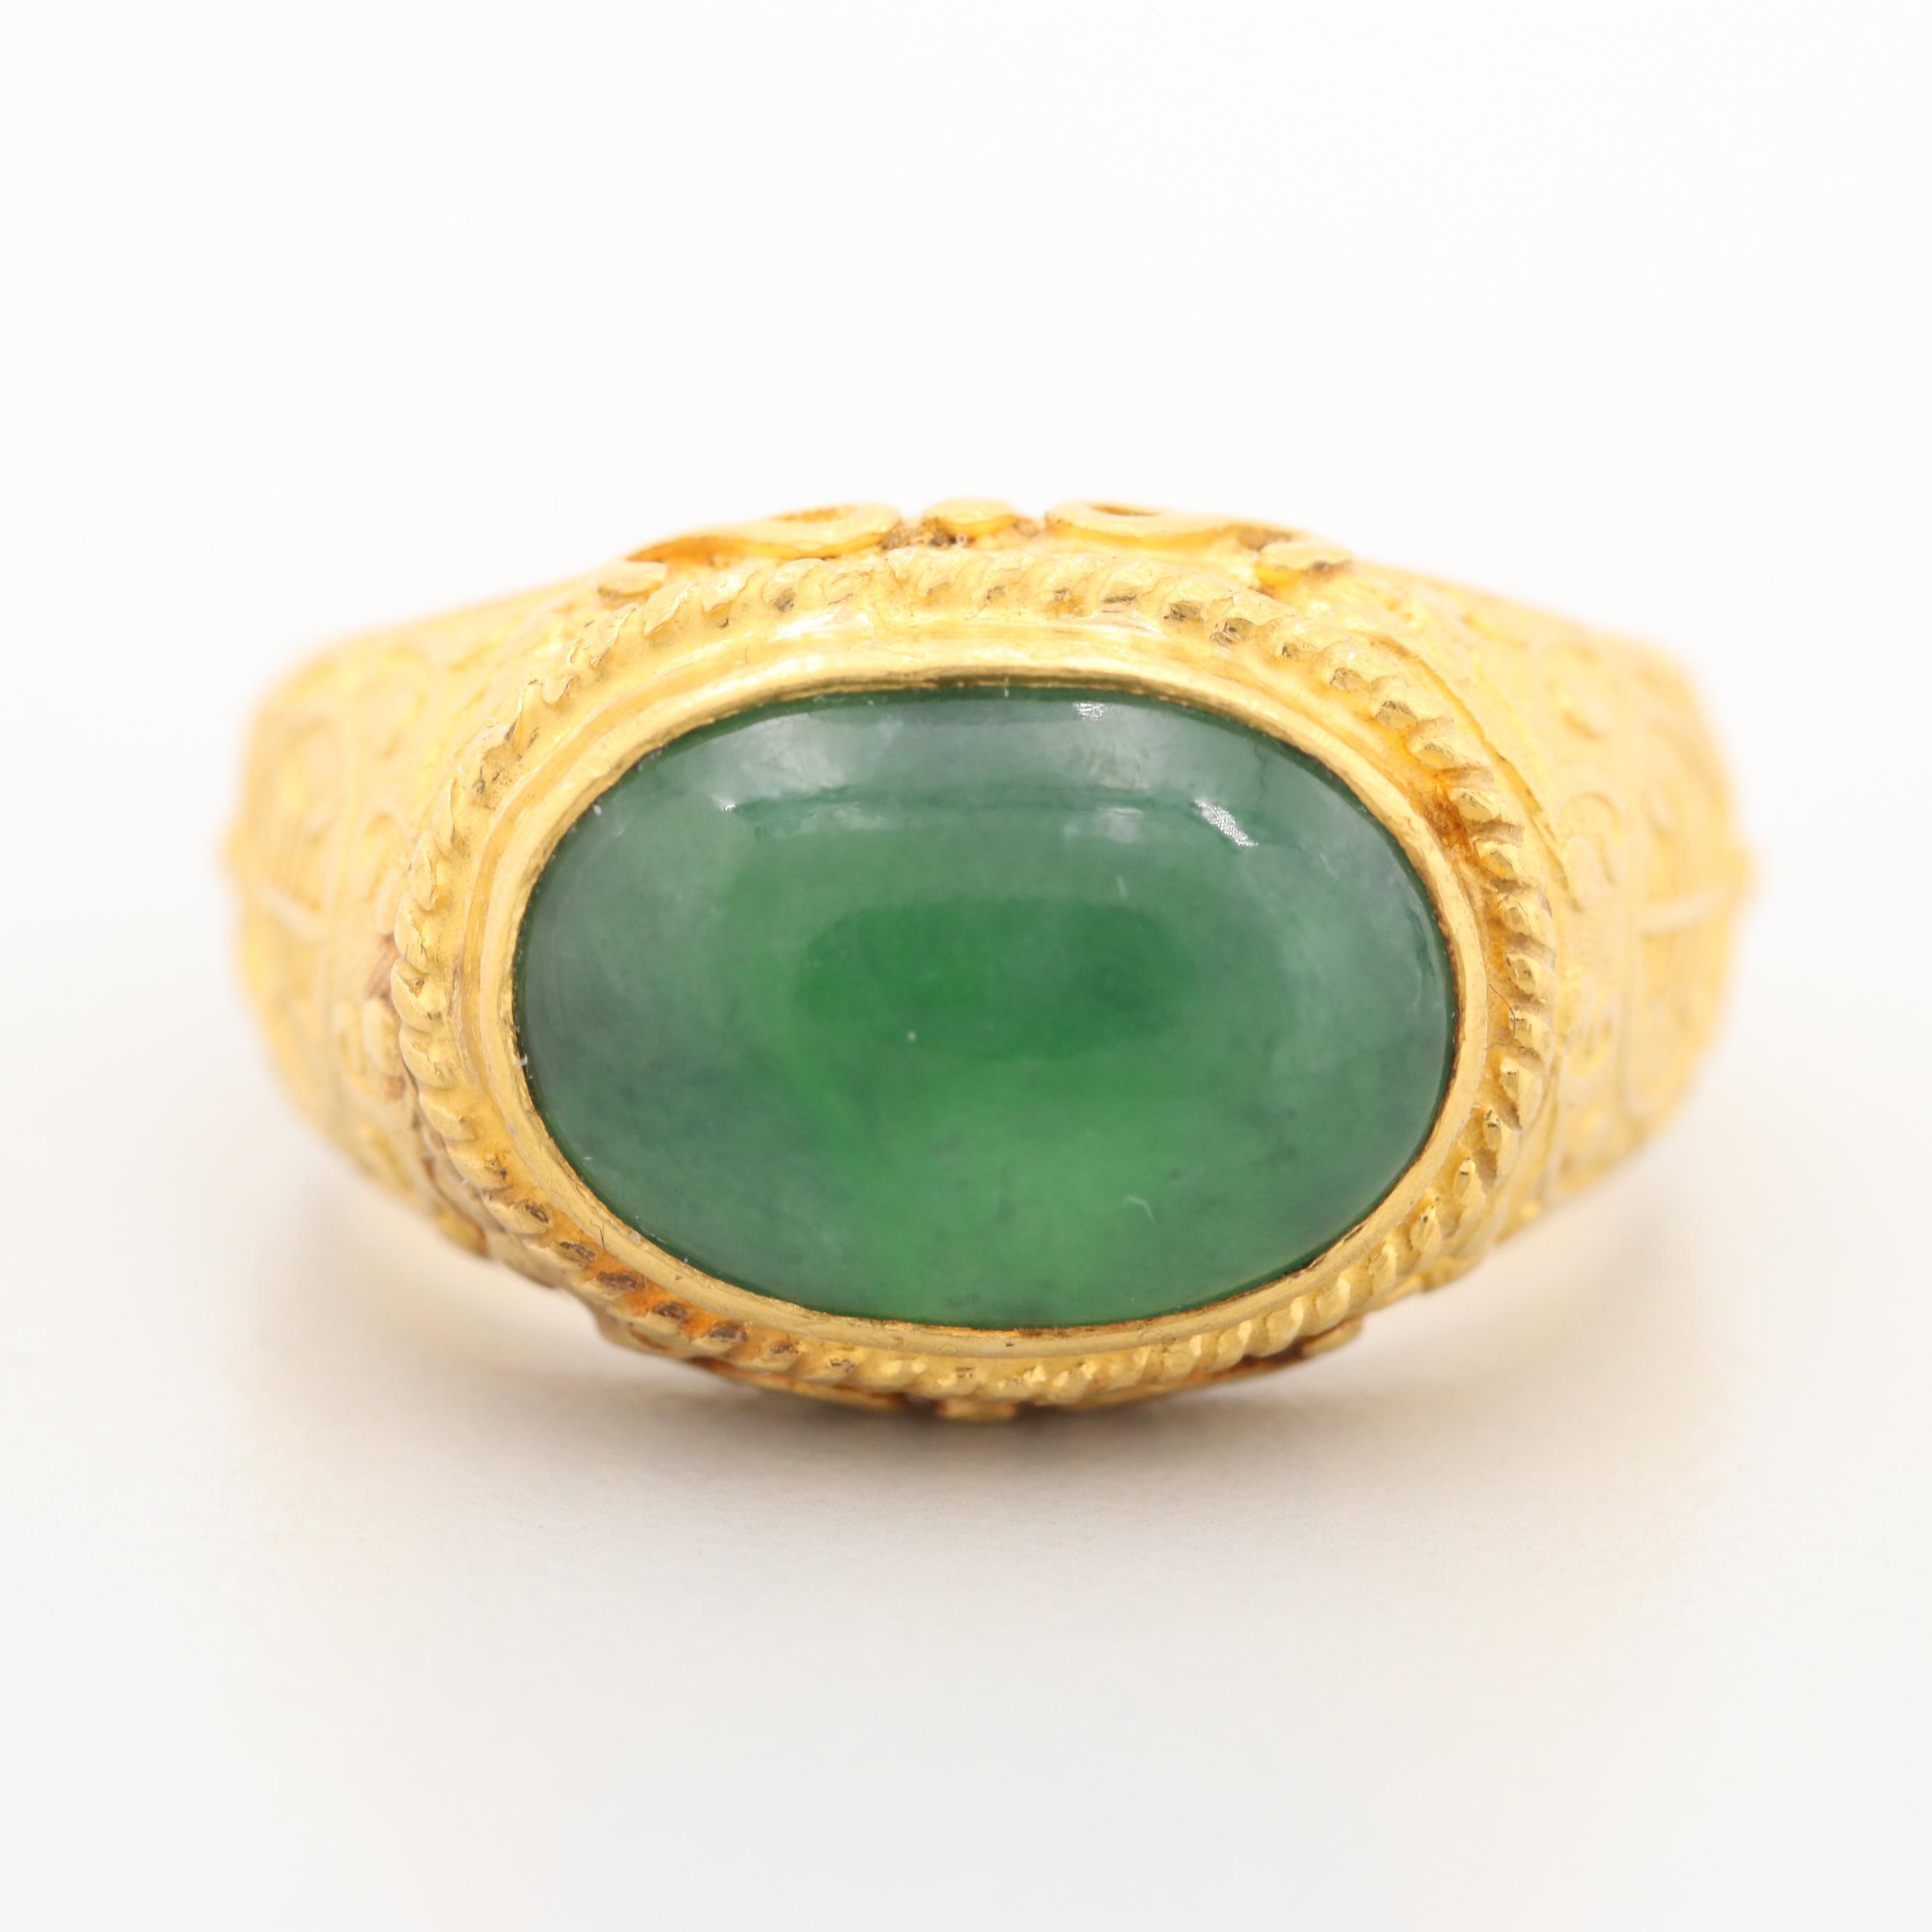 Chinese 24K Yellow Gold Jadeite Ring with Longevity Motif